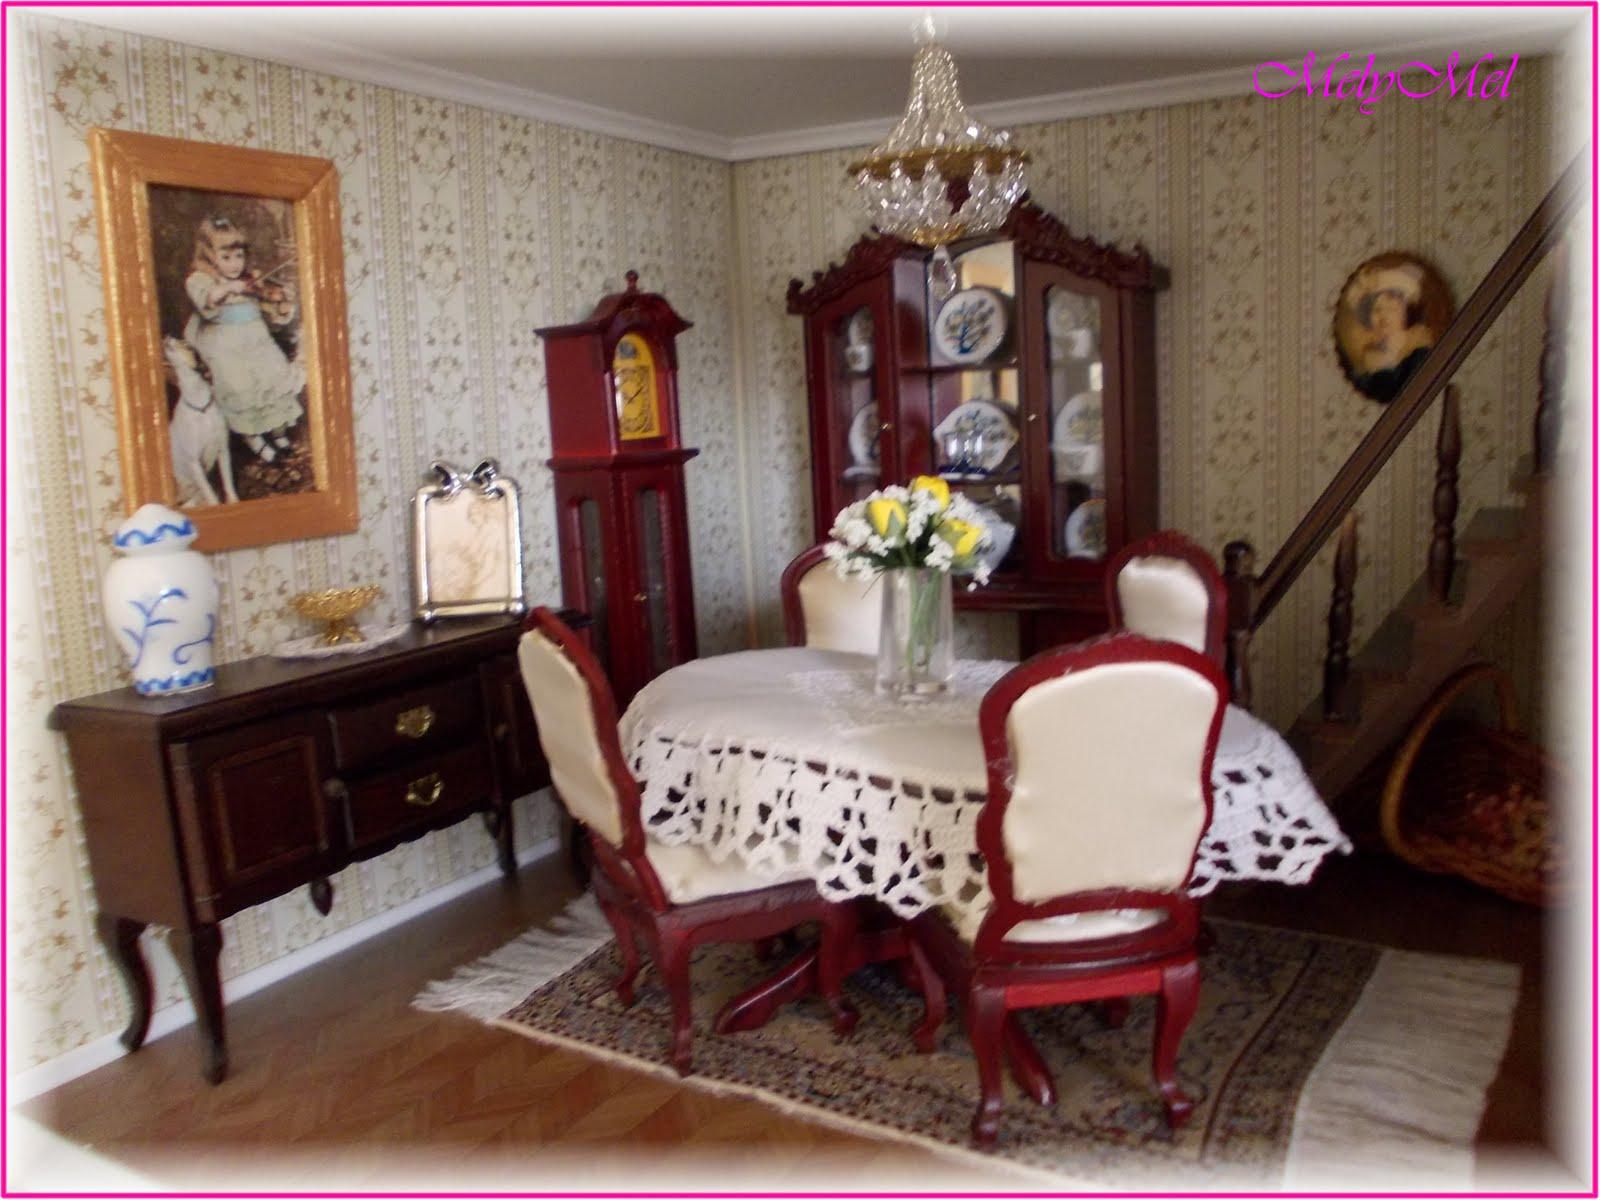 Melymel piccoli sogni la sala da pranzo prima parte for Sala pranzo vecchia